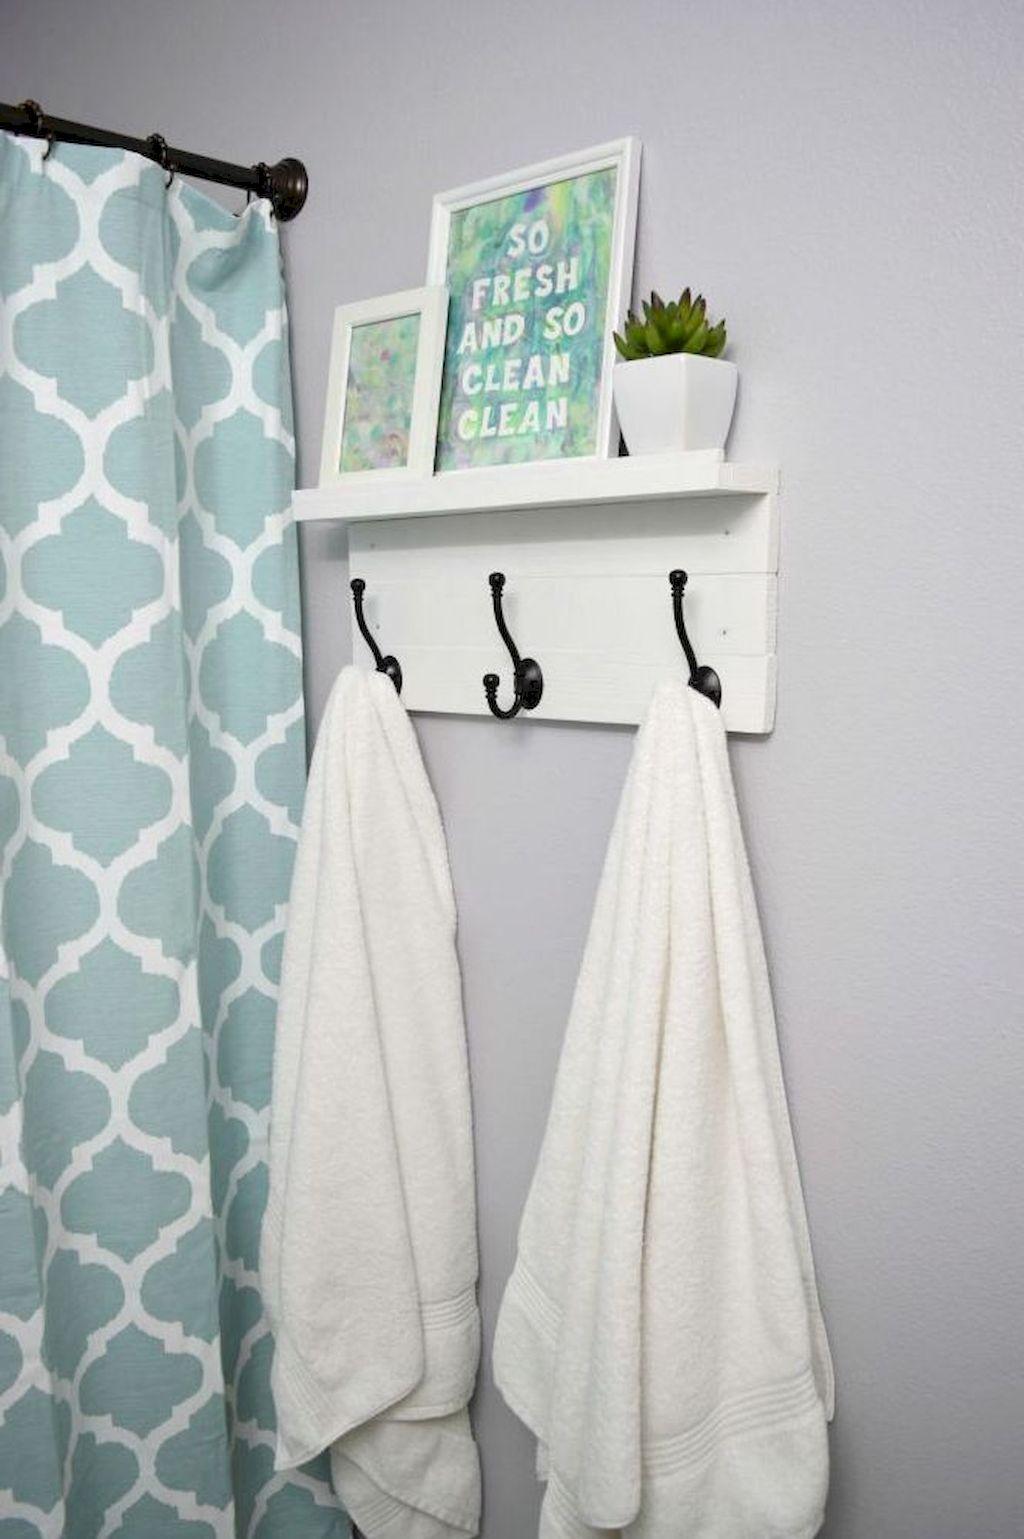 80 Small Apartment Bathroom Remodel Ideas | Small apartments ...